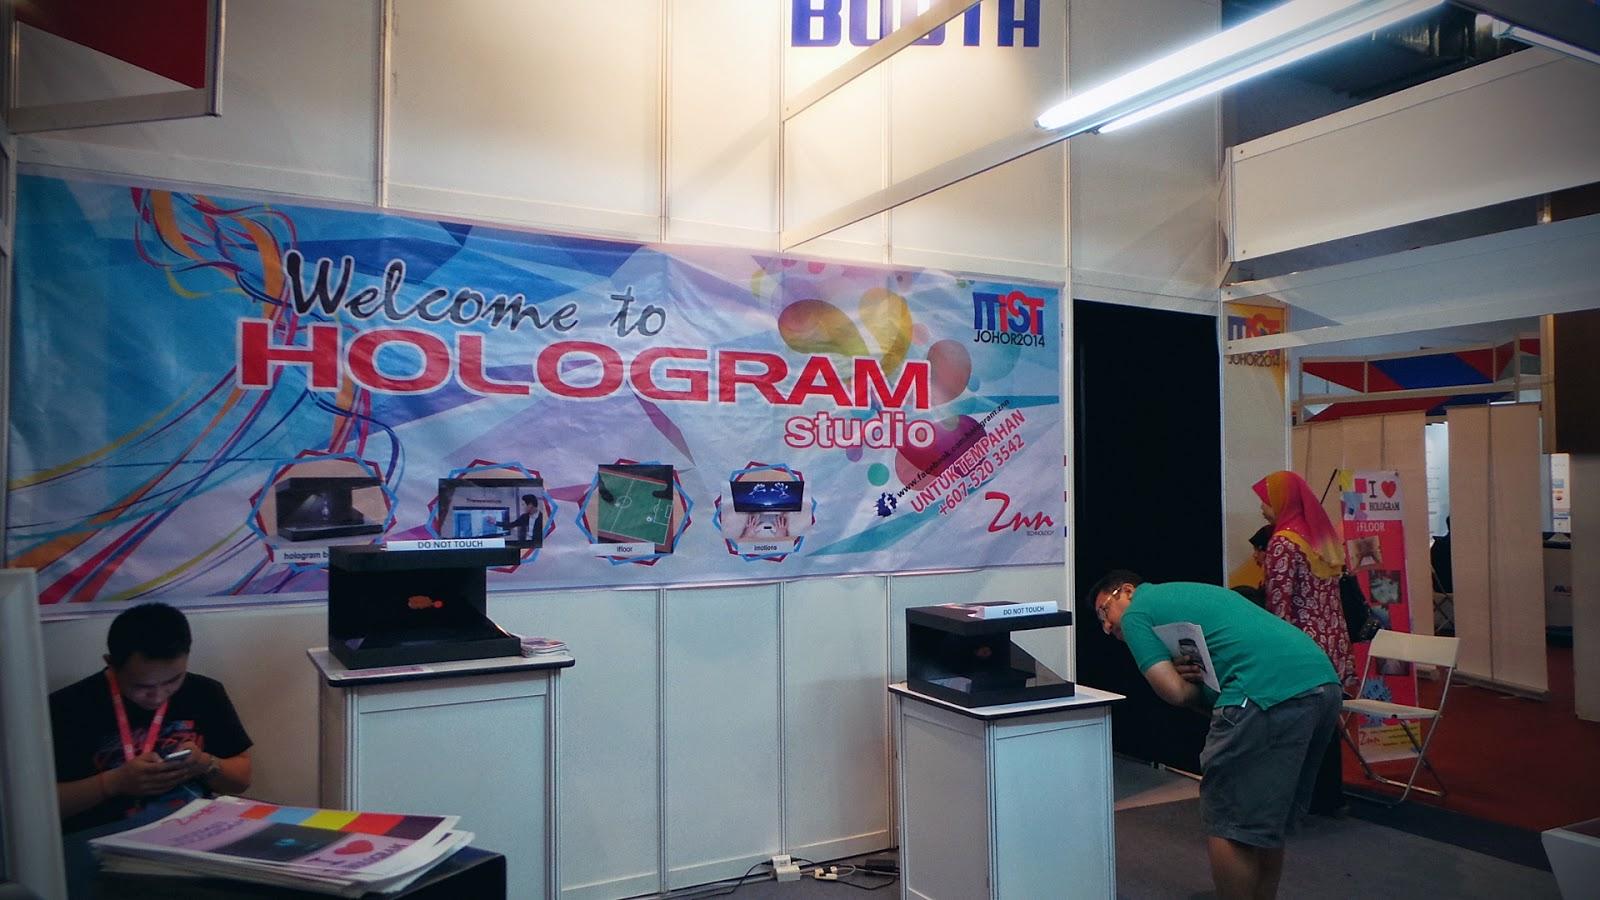 Minggu Sains Teknologi Dan Ict Negeri Johor 2014 Misti Casing Alcatroz Azzura Z1 Vx Best Buy Pc Case Cam Ja